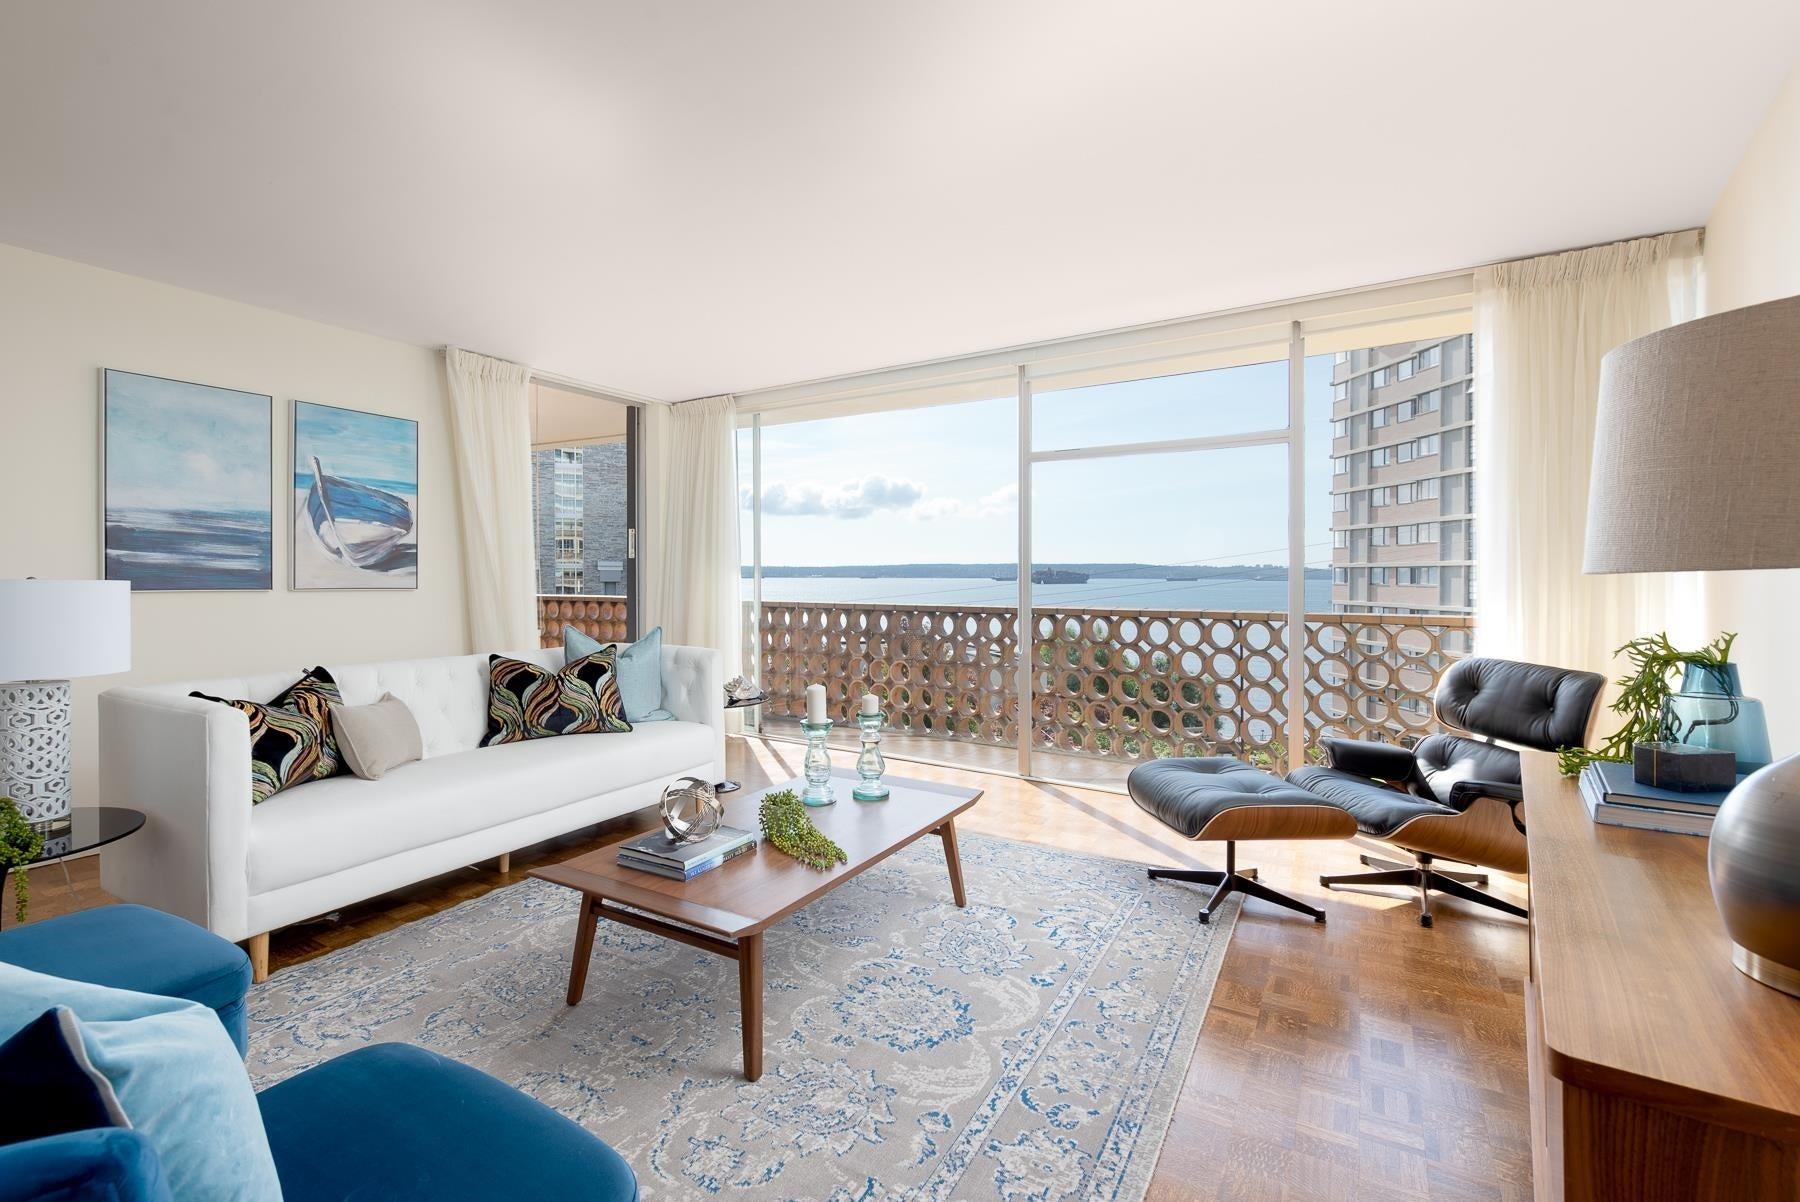 405 2135 ARGYLE AVENUE - Dundarave Apartment/Condo for sale, 2 Bedrooms (R2621521) - #1